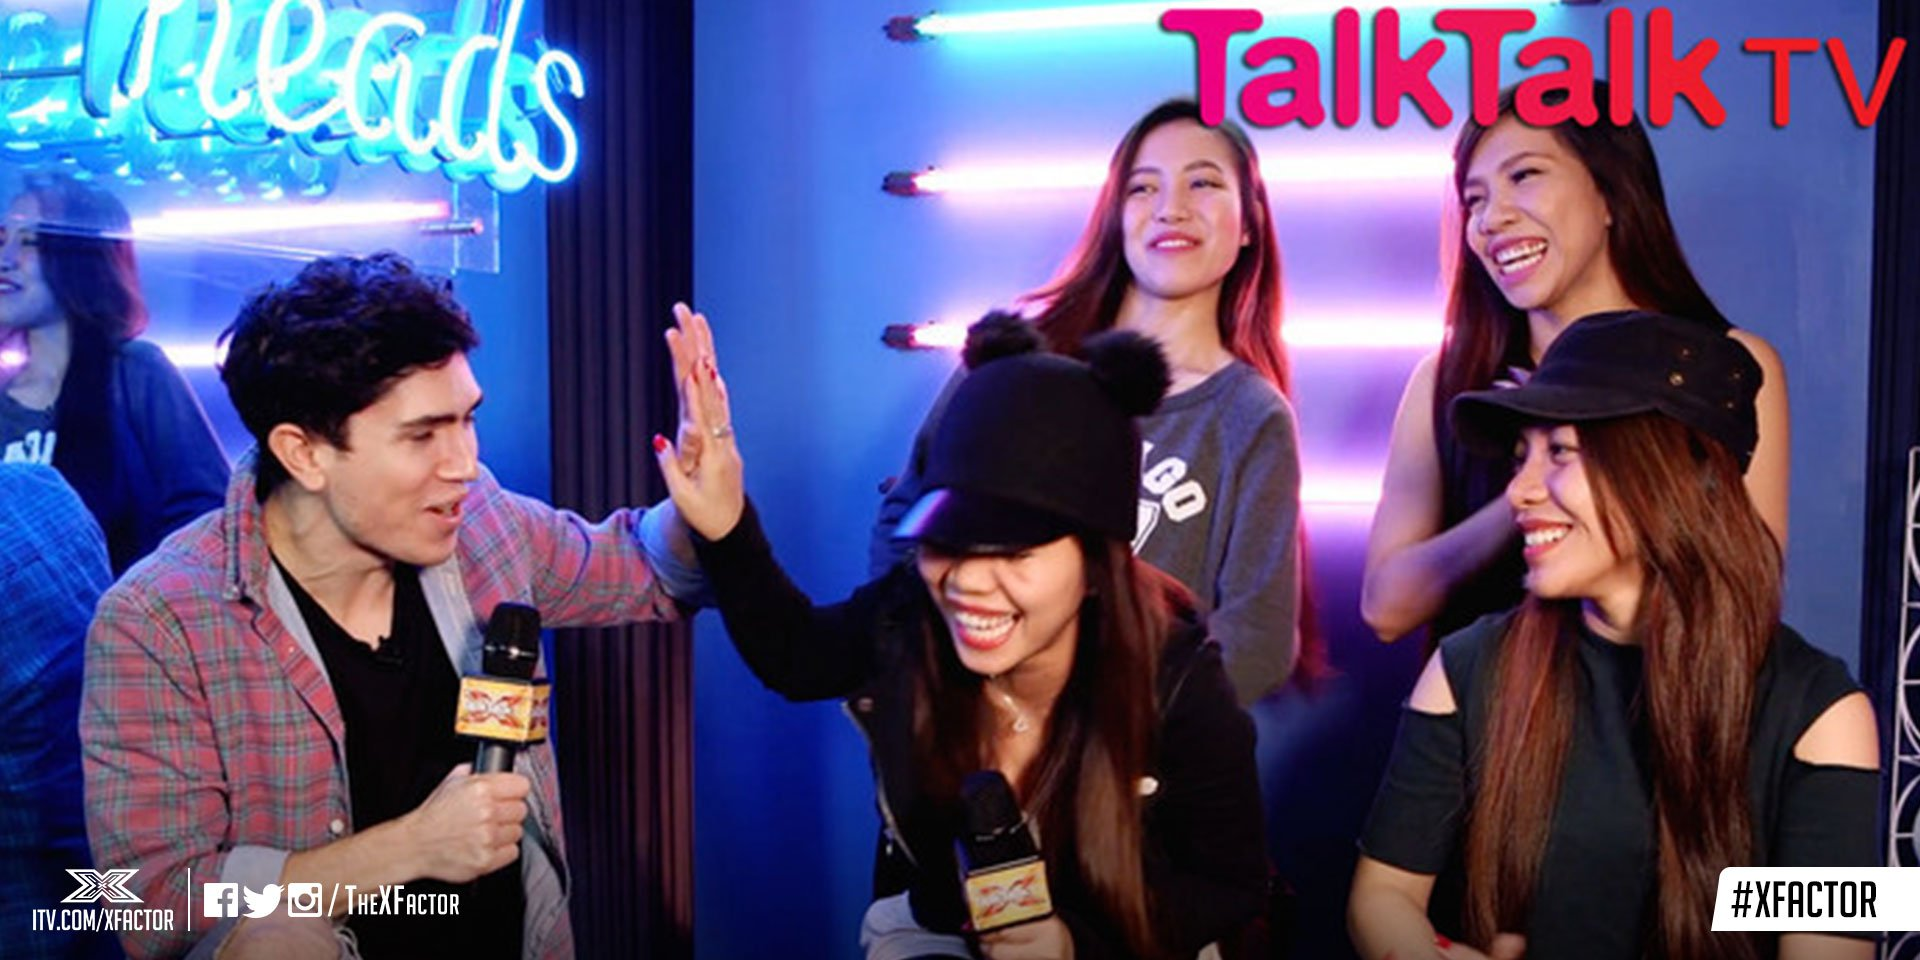 .@Luke_Franks has a chat with @4thImpactMusic backstage at #XFactor Jukebox Week: https://t.co/89YODk0N5b #spon https://t.co/wMoaFHEUeD